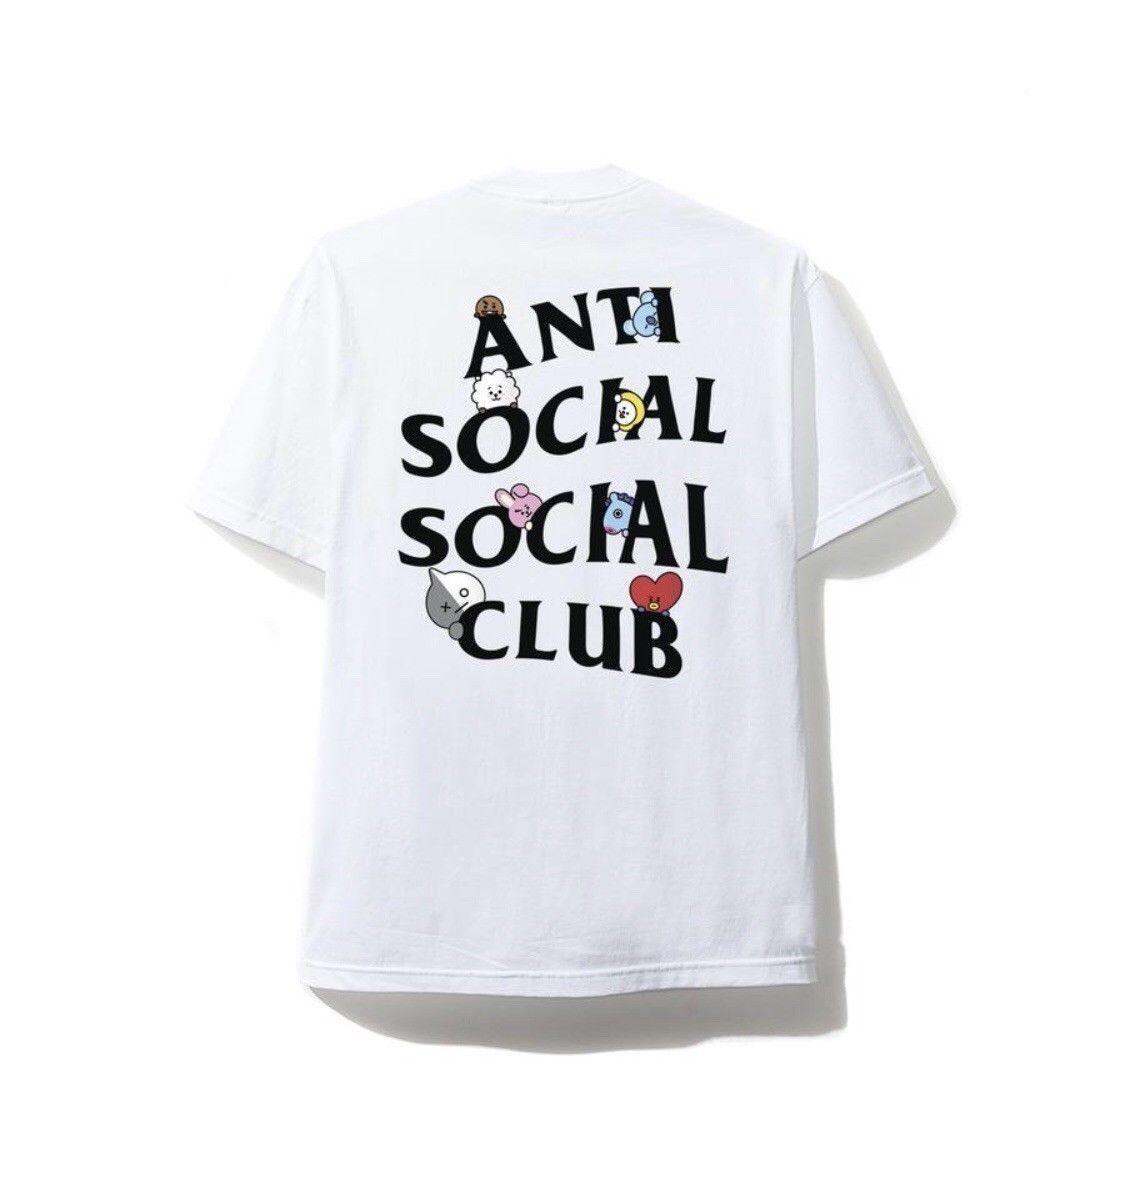 Anti Social Social Club x BT21 Club Peekaboo Tee White Size S M L XL